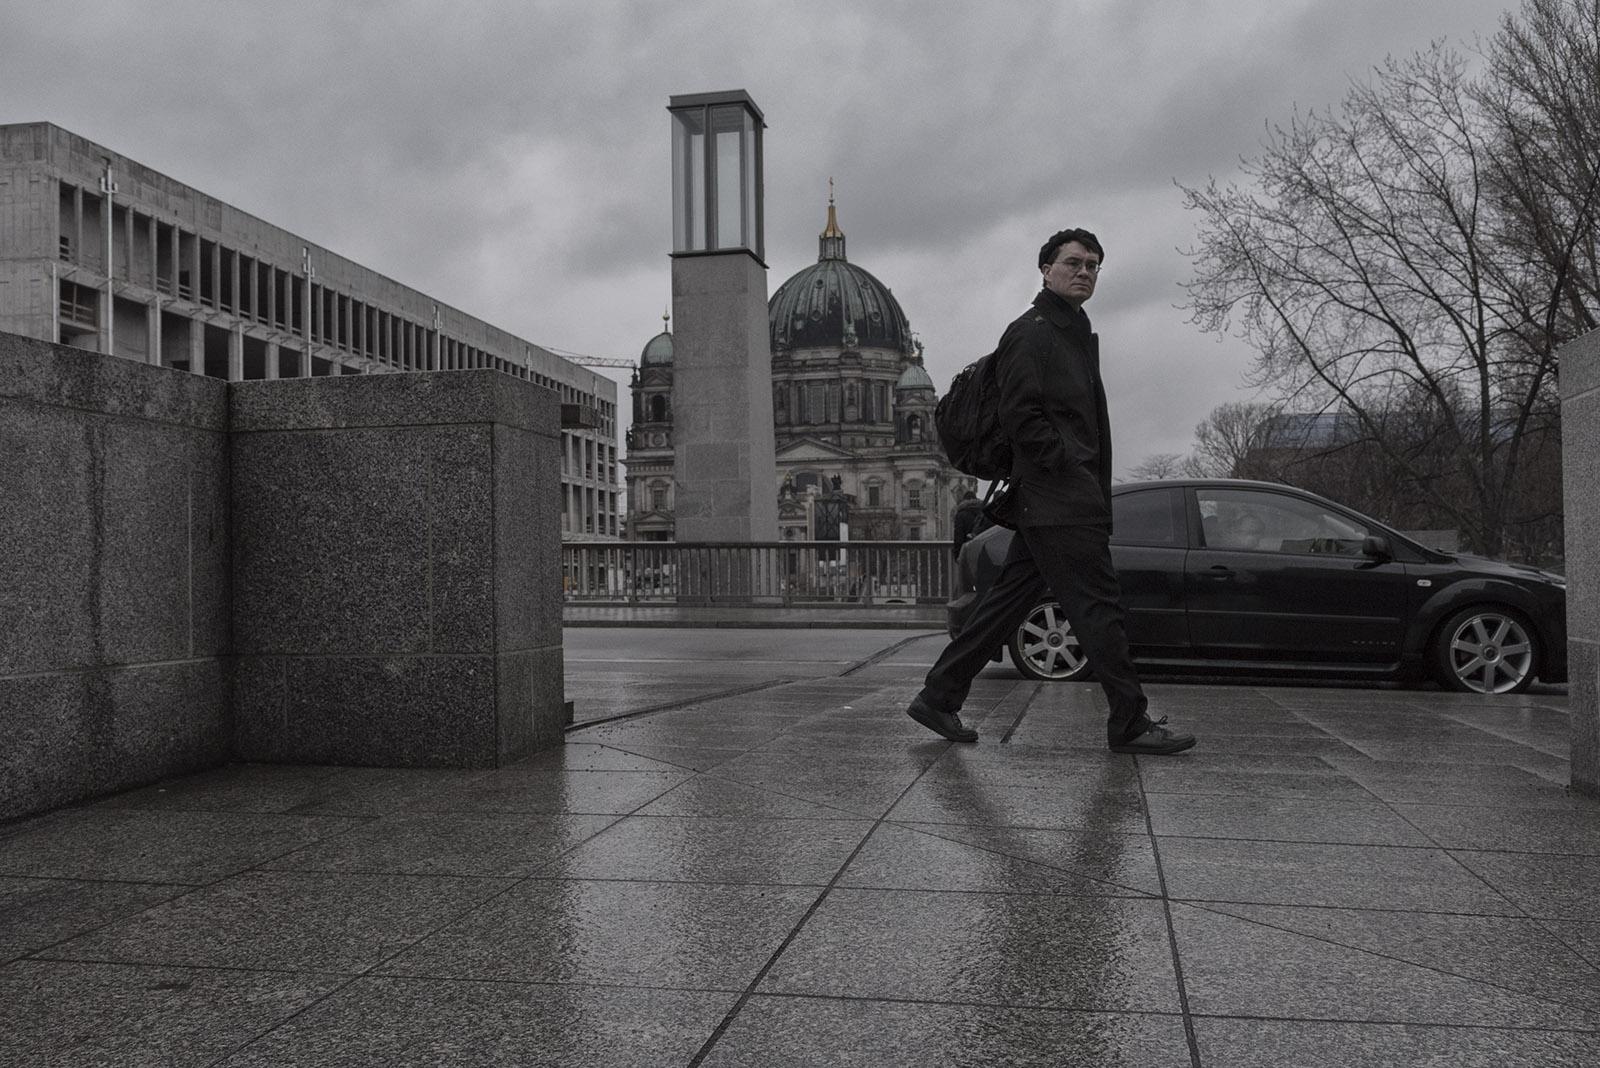 berlino_street_006.jpg